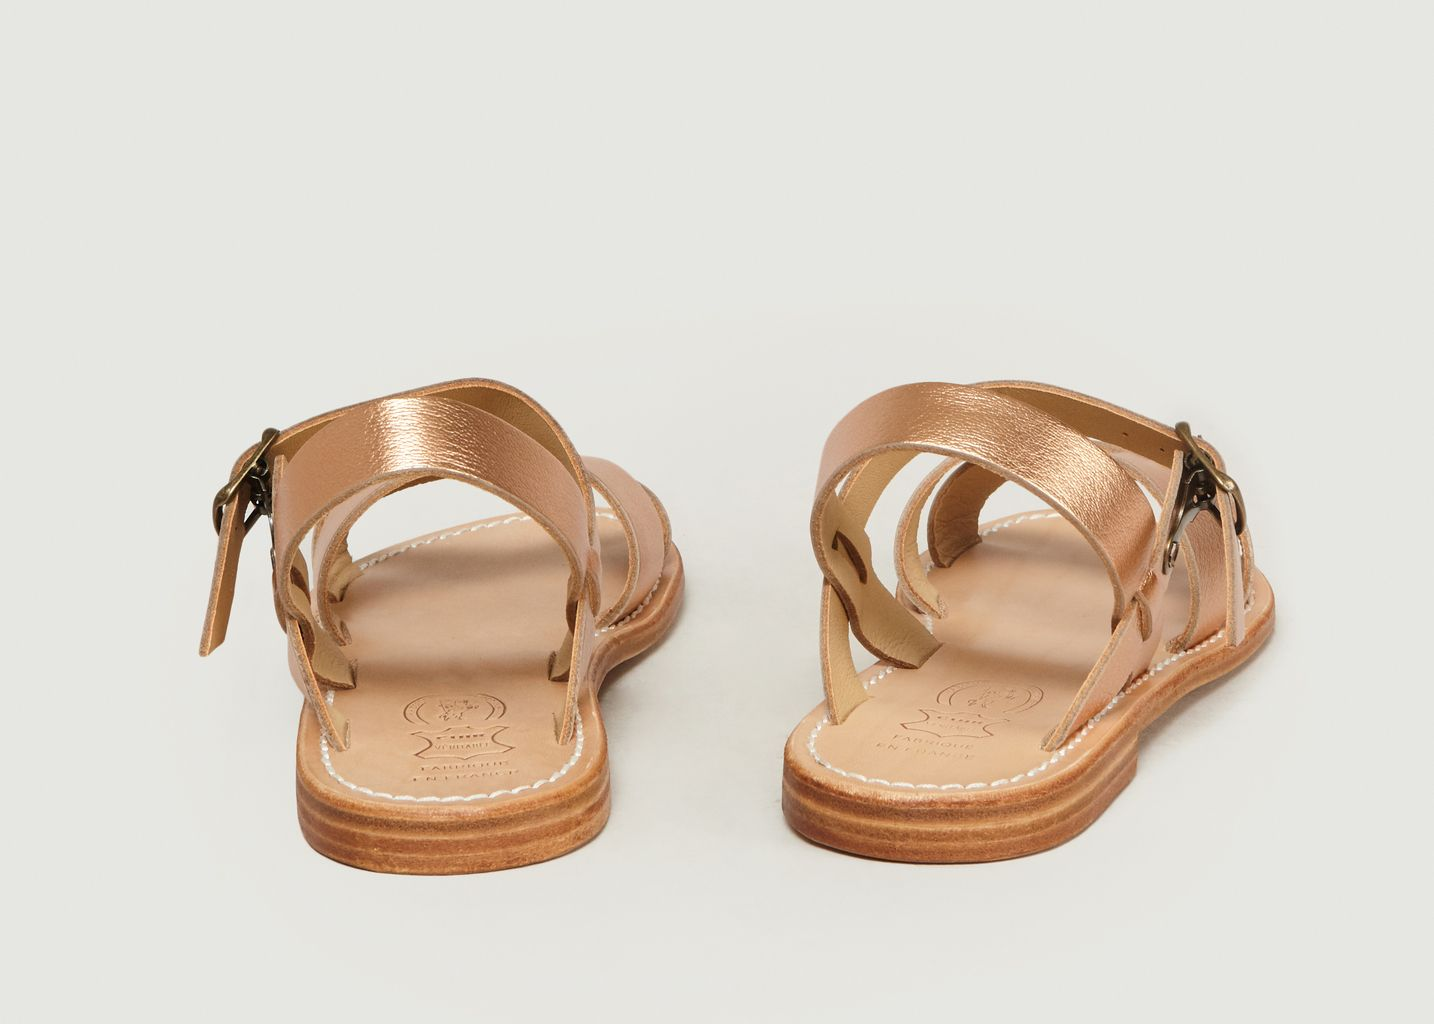 Sandales Pac - La Botte Gardiane